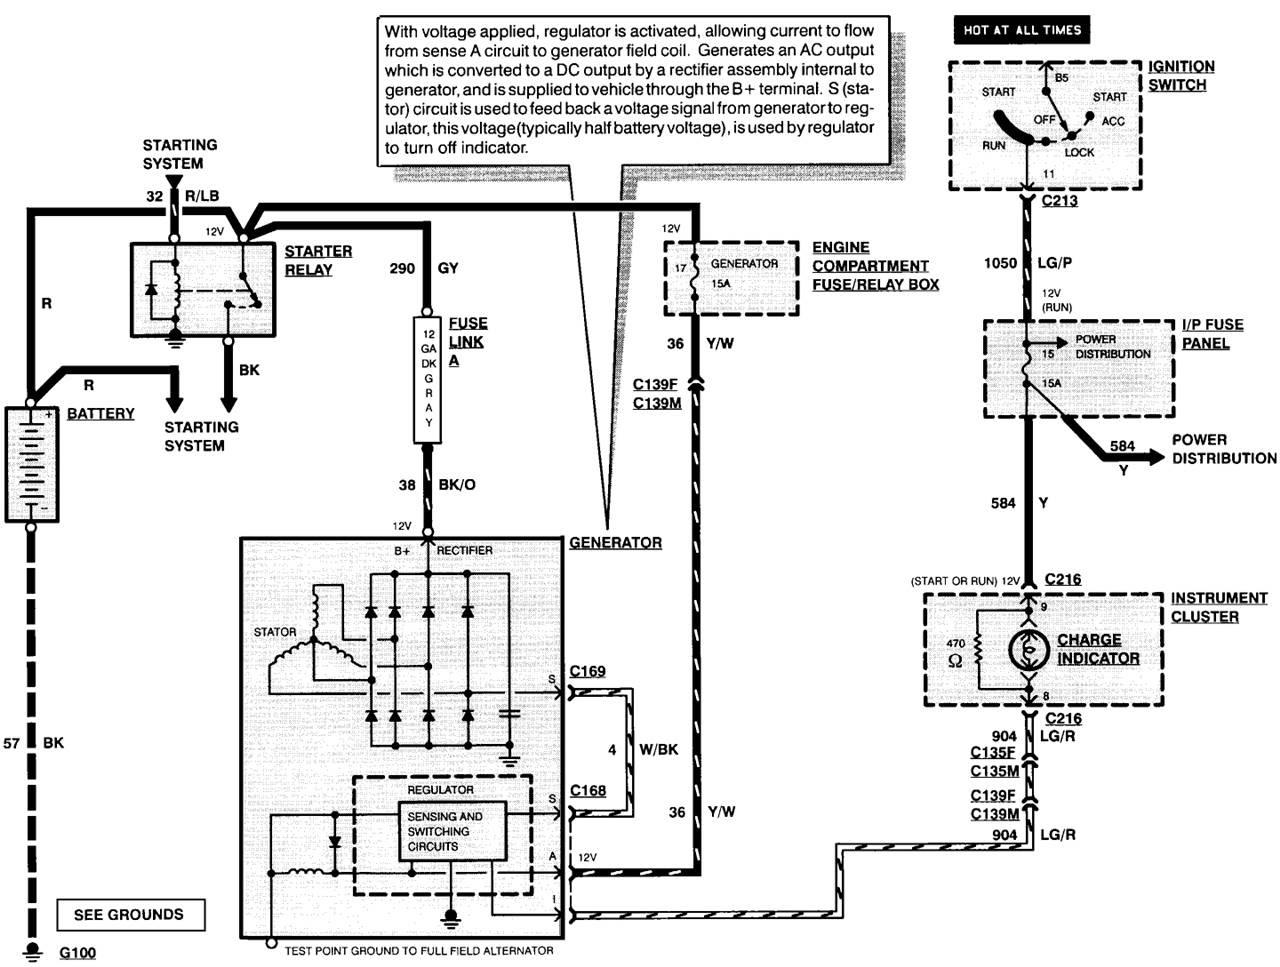 1990 Ford F150 Alternator Wiring Diagram Wiring Diagram Corsa C Corsa C Pasticceriagele It